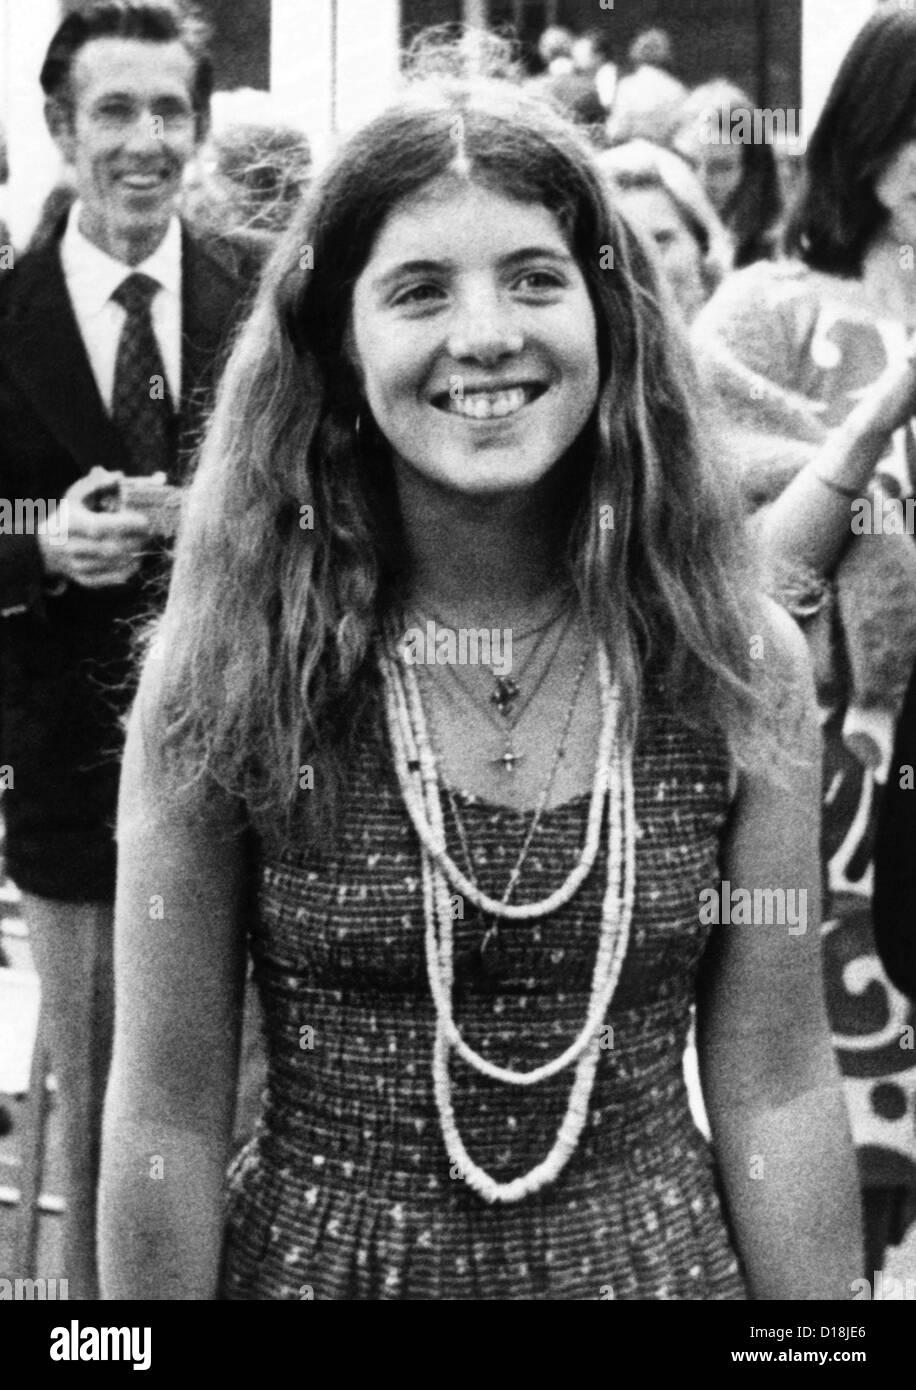 Caroline Kennedy, 17-jährige Tochter des ermordeten Präsidenten John F. Kennedy. 1975. (CSU_ALPHA_835) CSU Archive/Everett Stockfoto